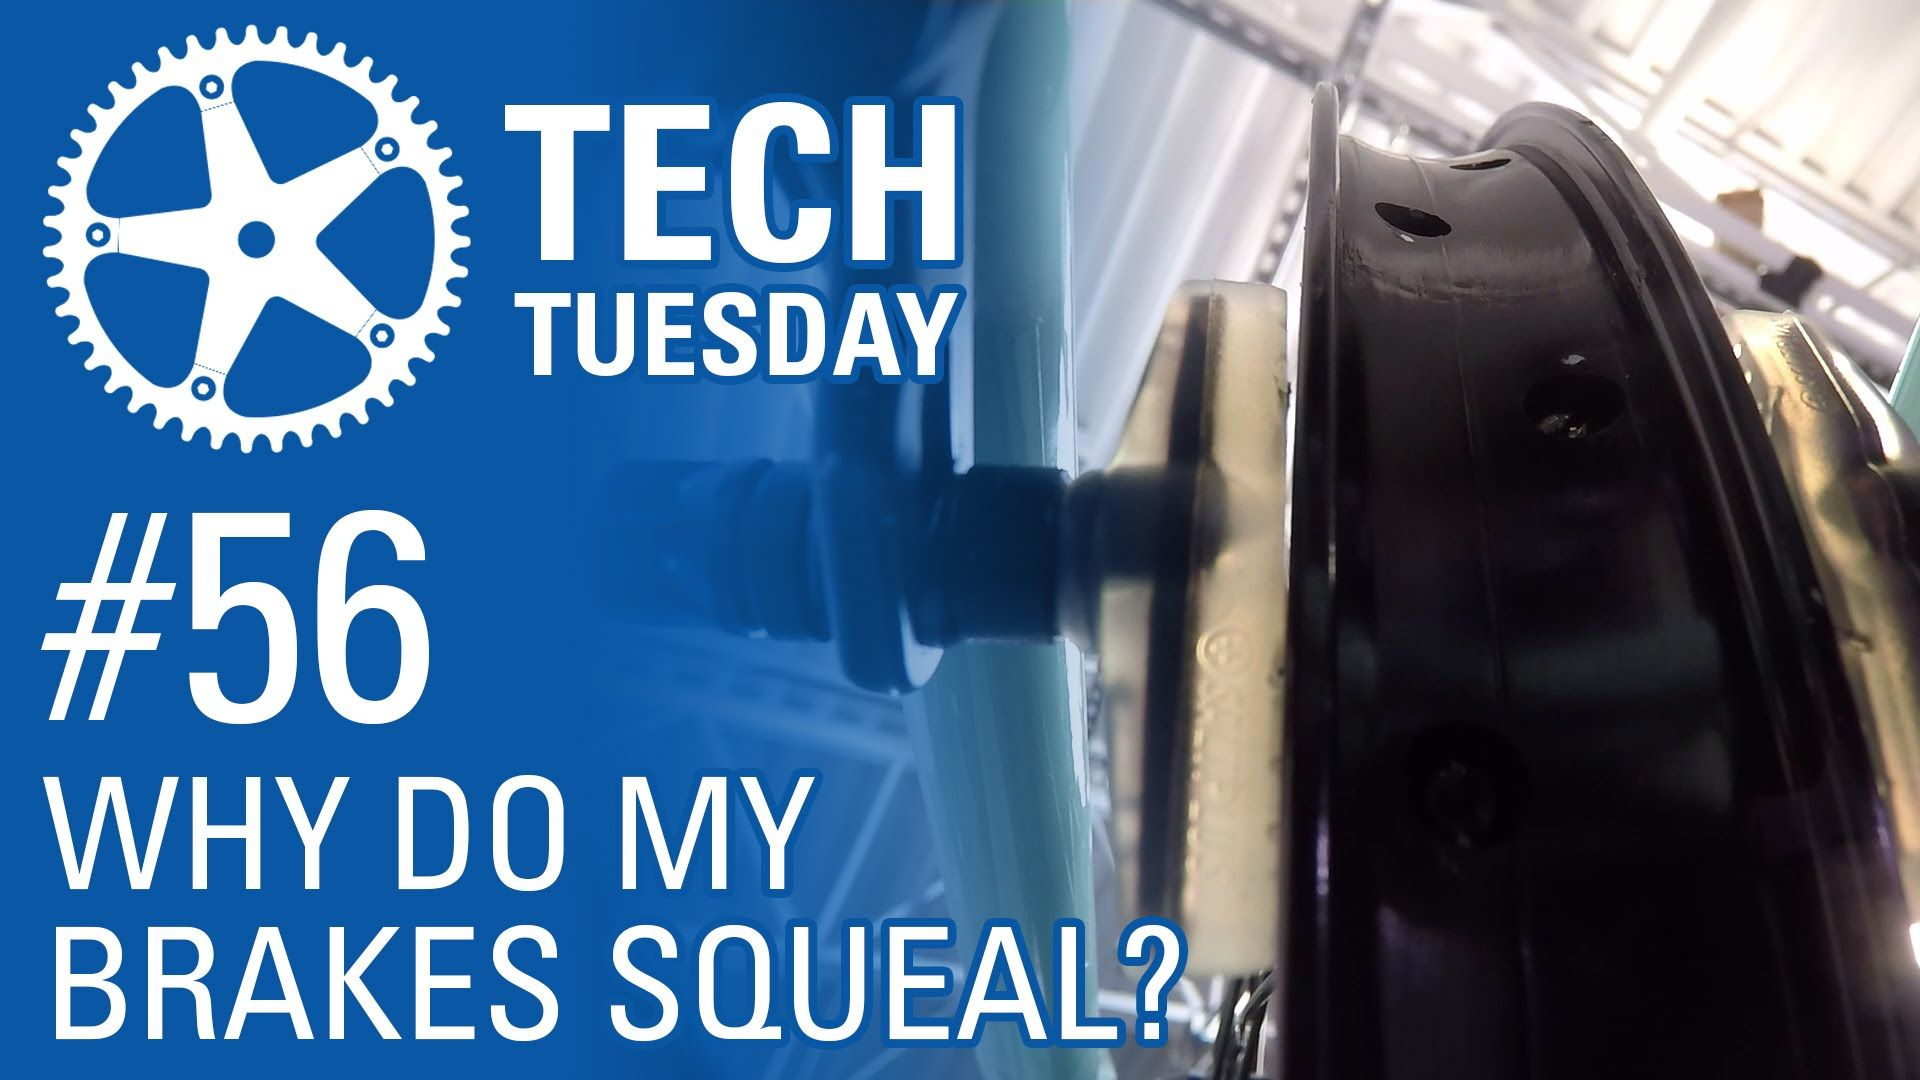 Why Do My Brakes Squeal? Tech Tuesday 56 (con imágenes)